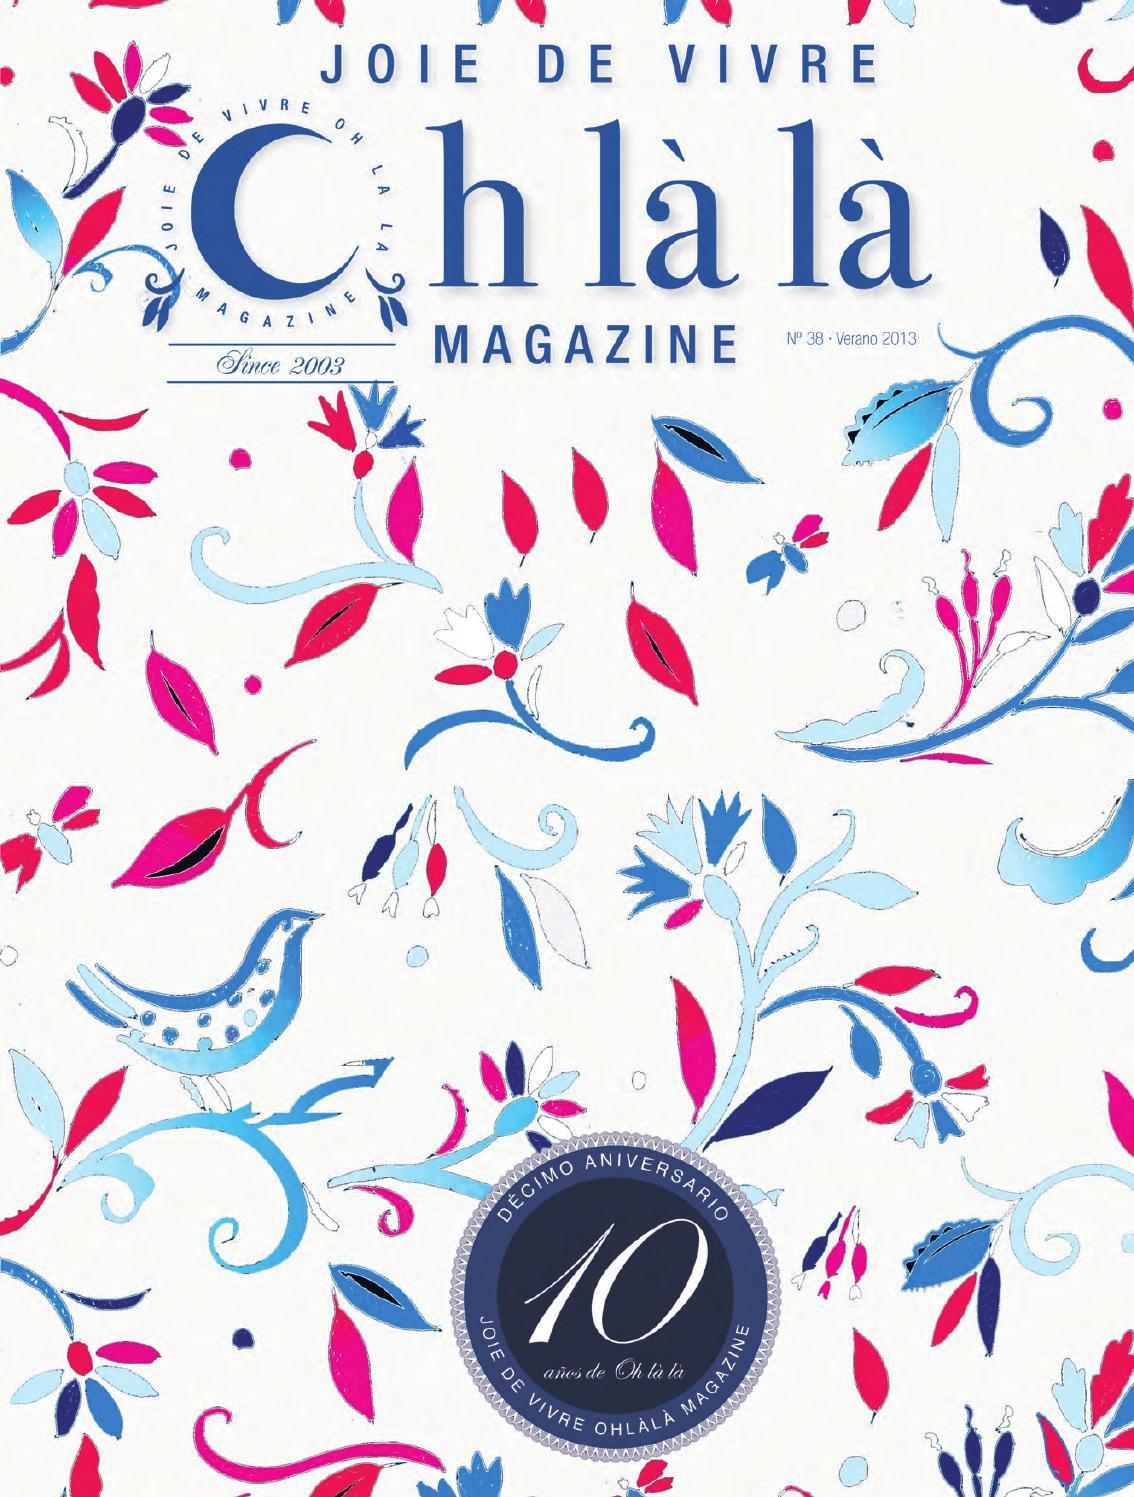 Verano Edición Ohlala 2013 Magazine 38 0nwk8OP